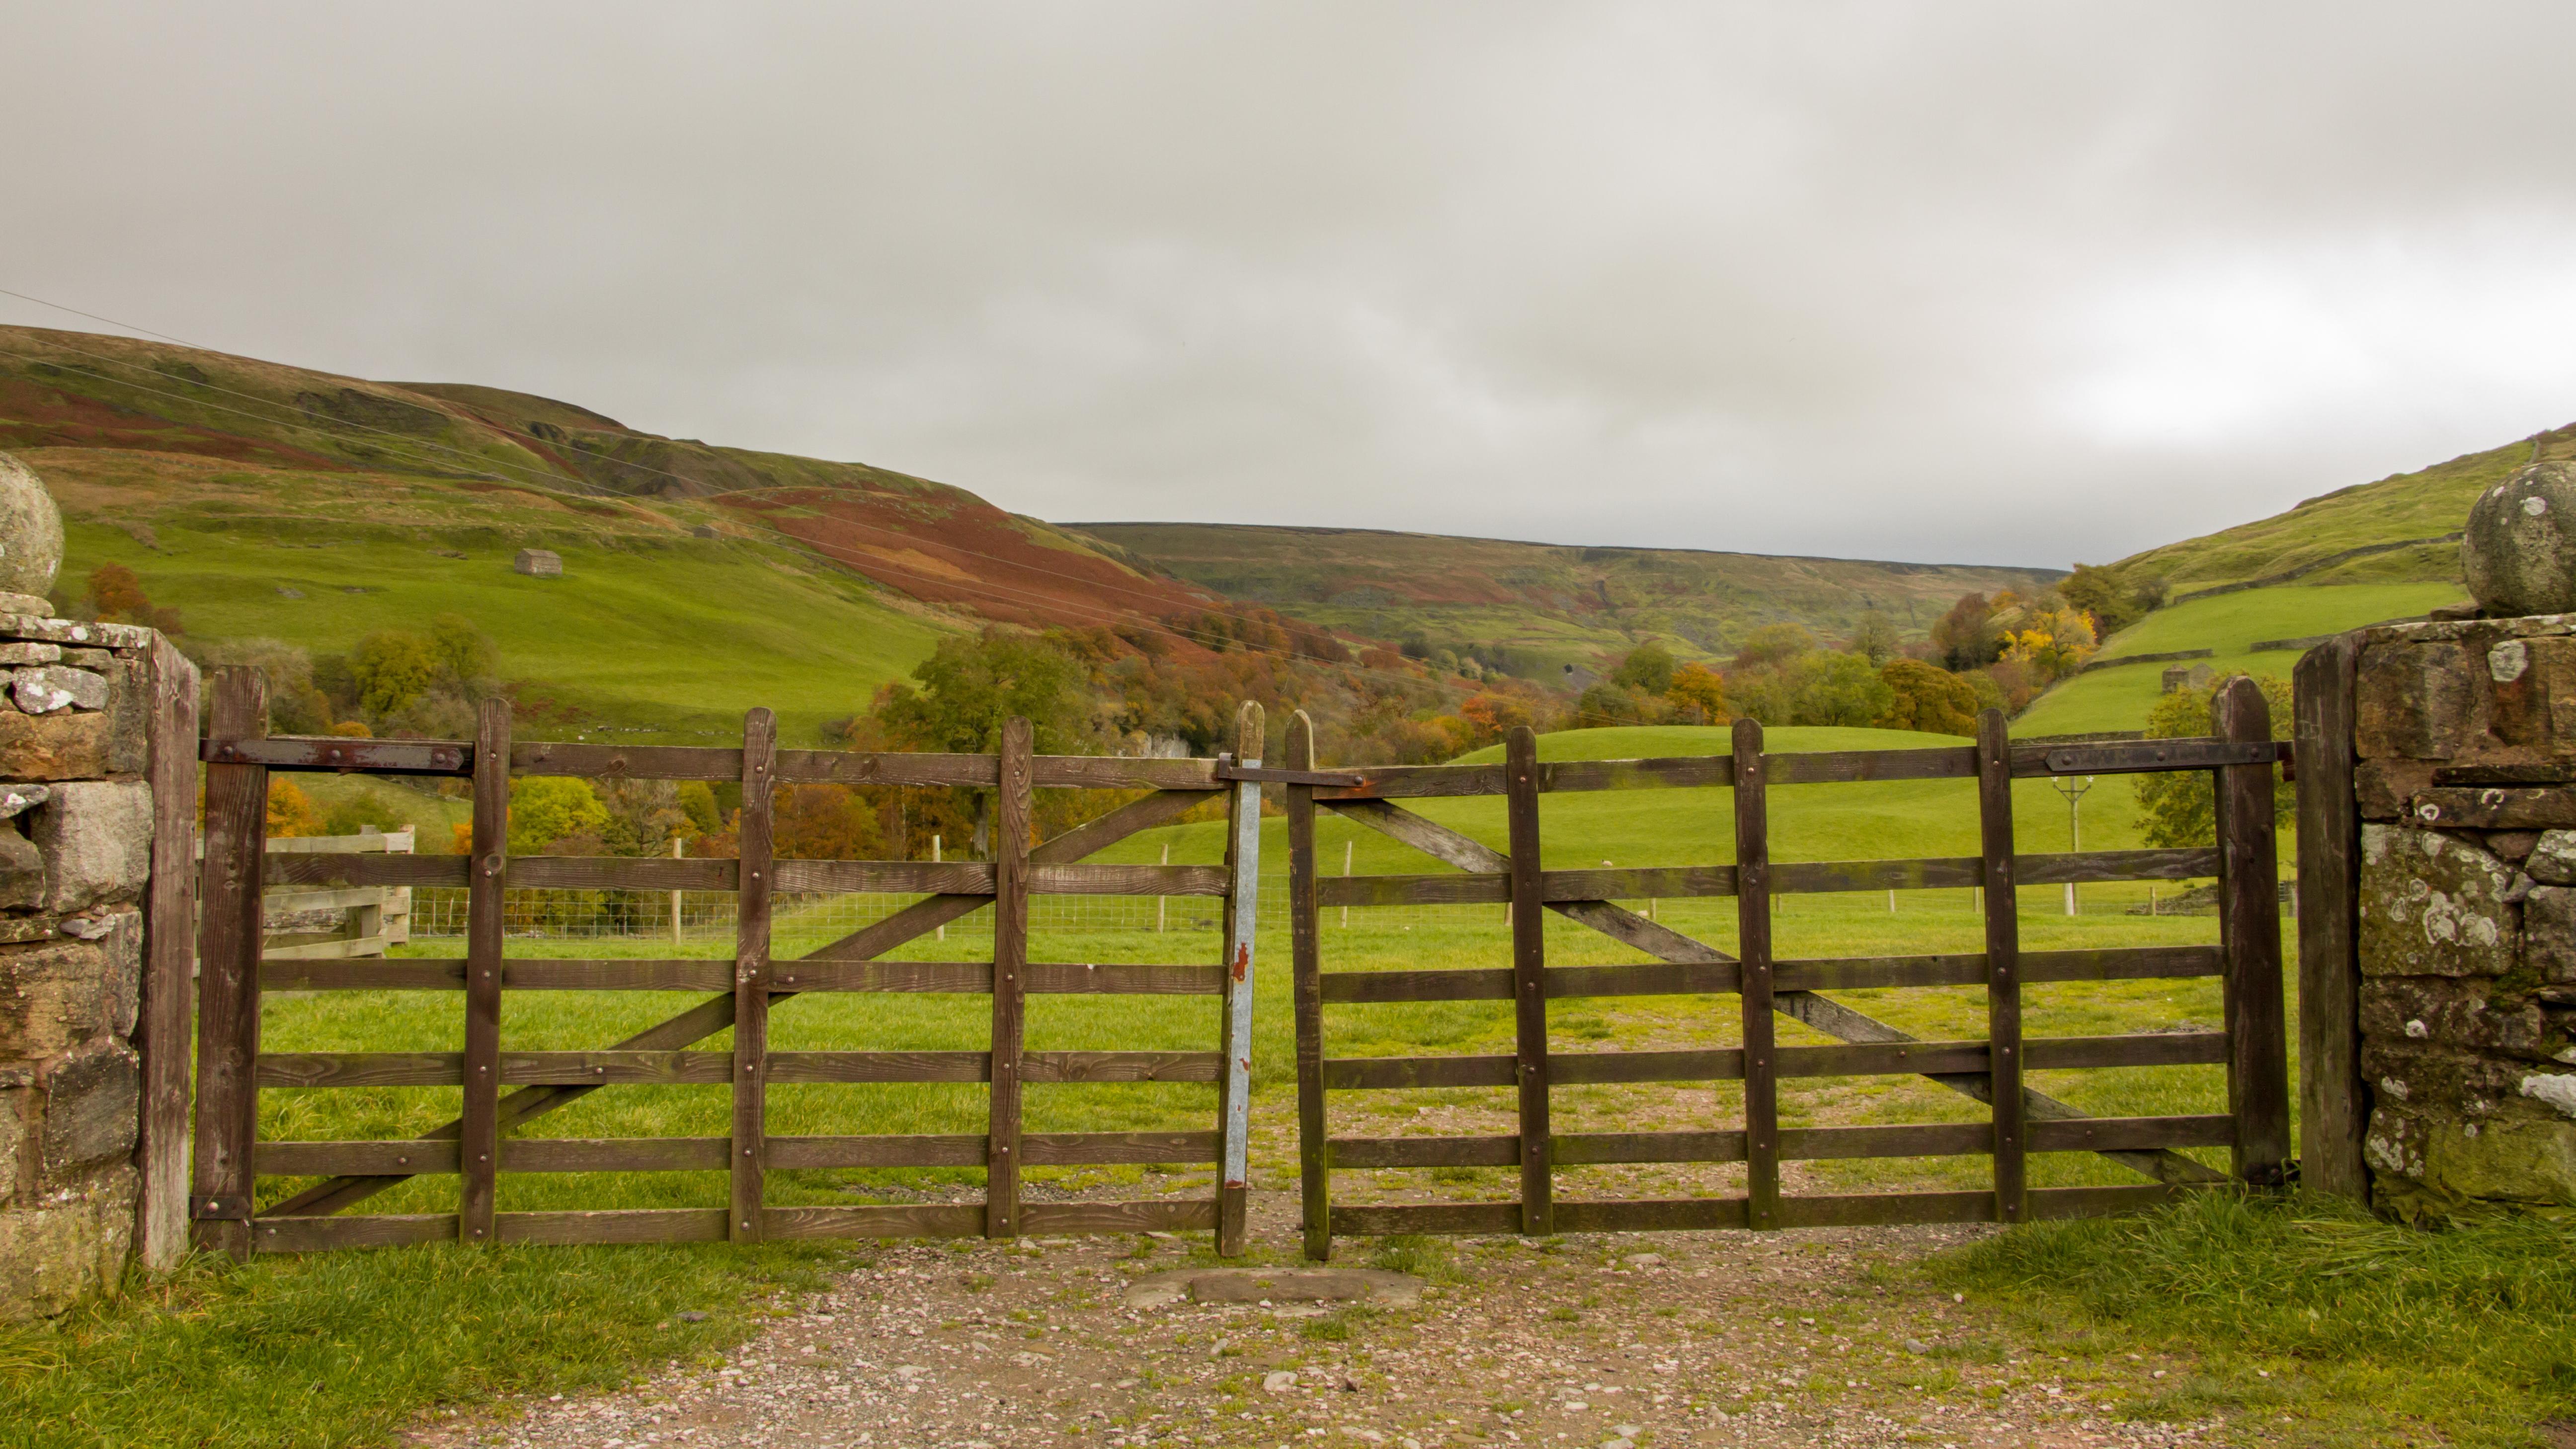 Rural Yorkshire